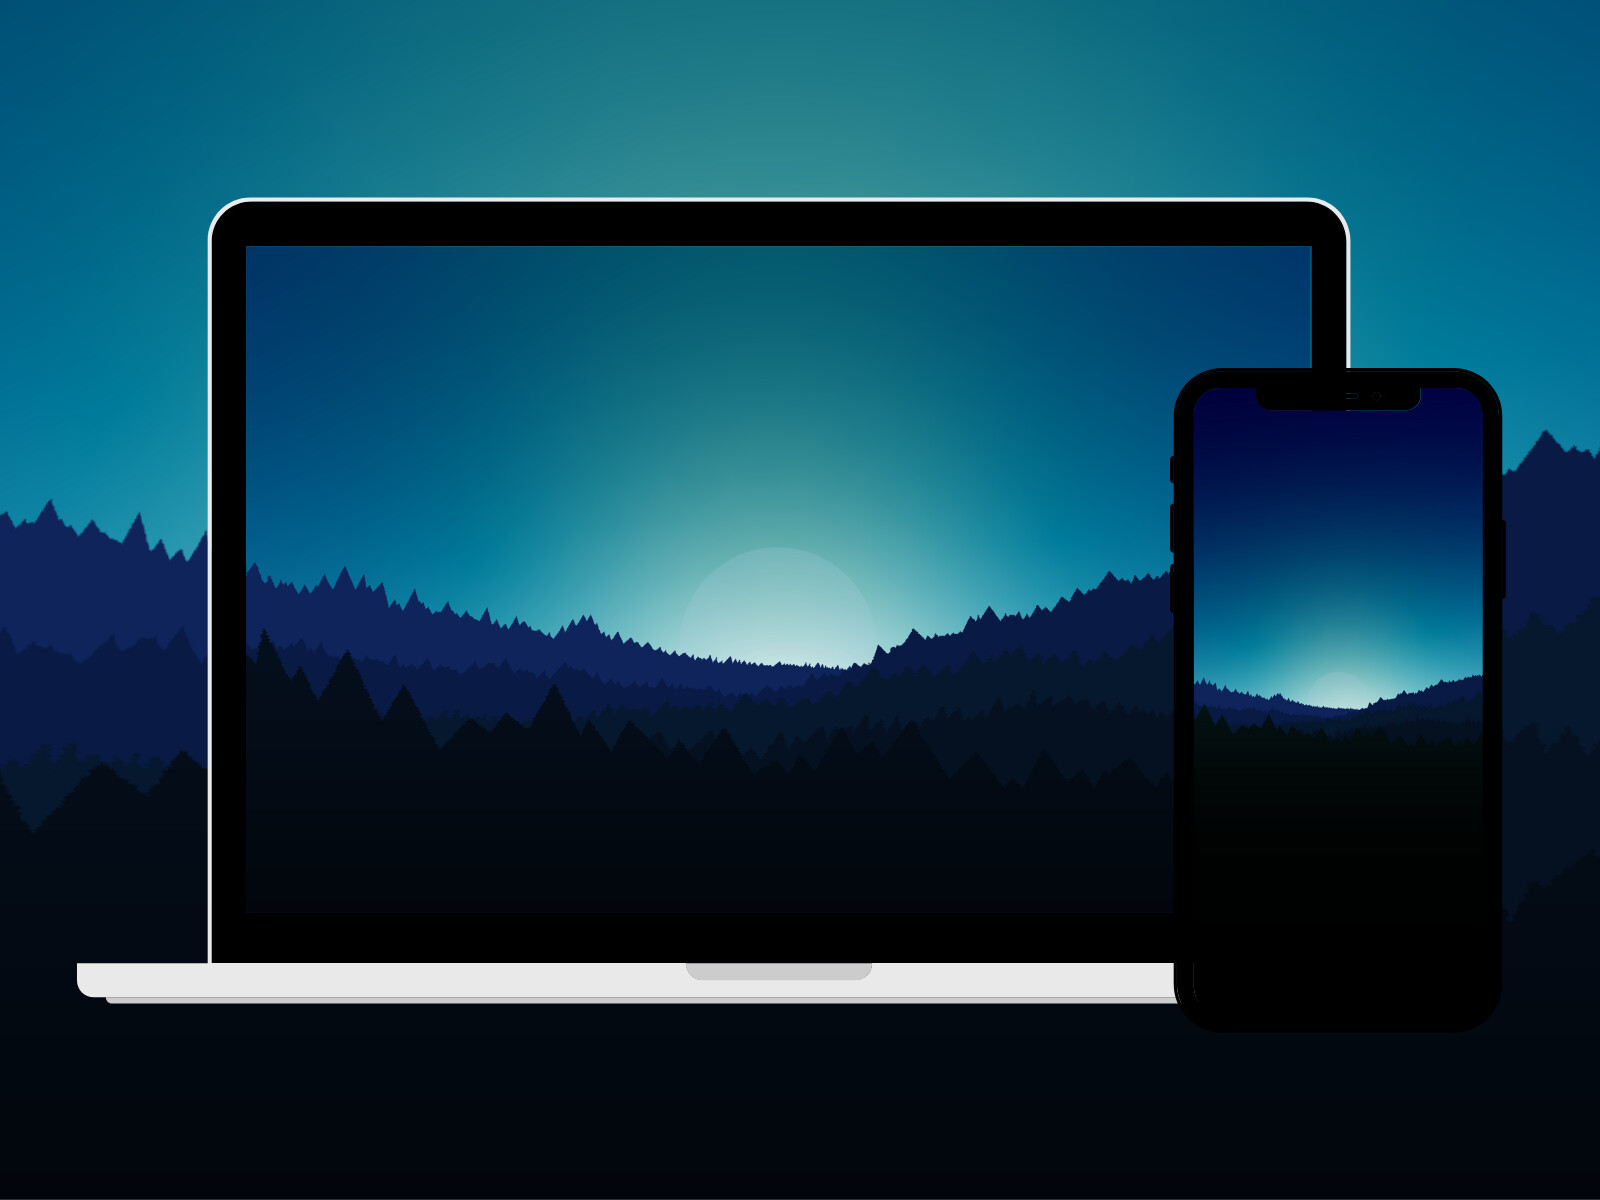 Download: https://www.heroscreen.cc/2021/02/minimalist-pc-wallpaper-4k.html